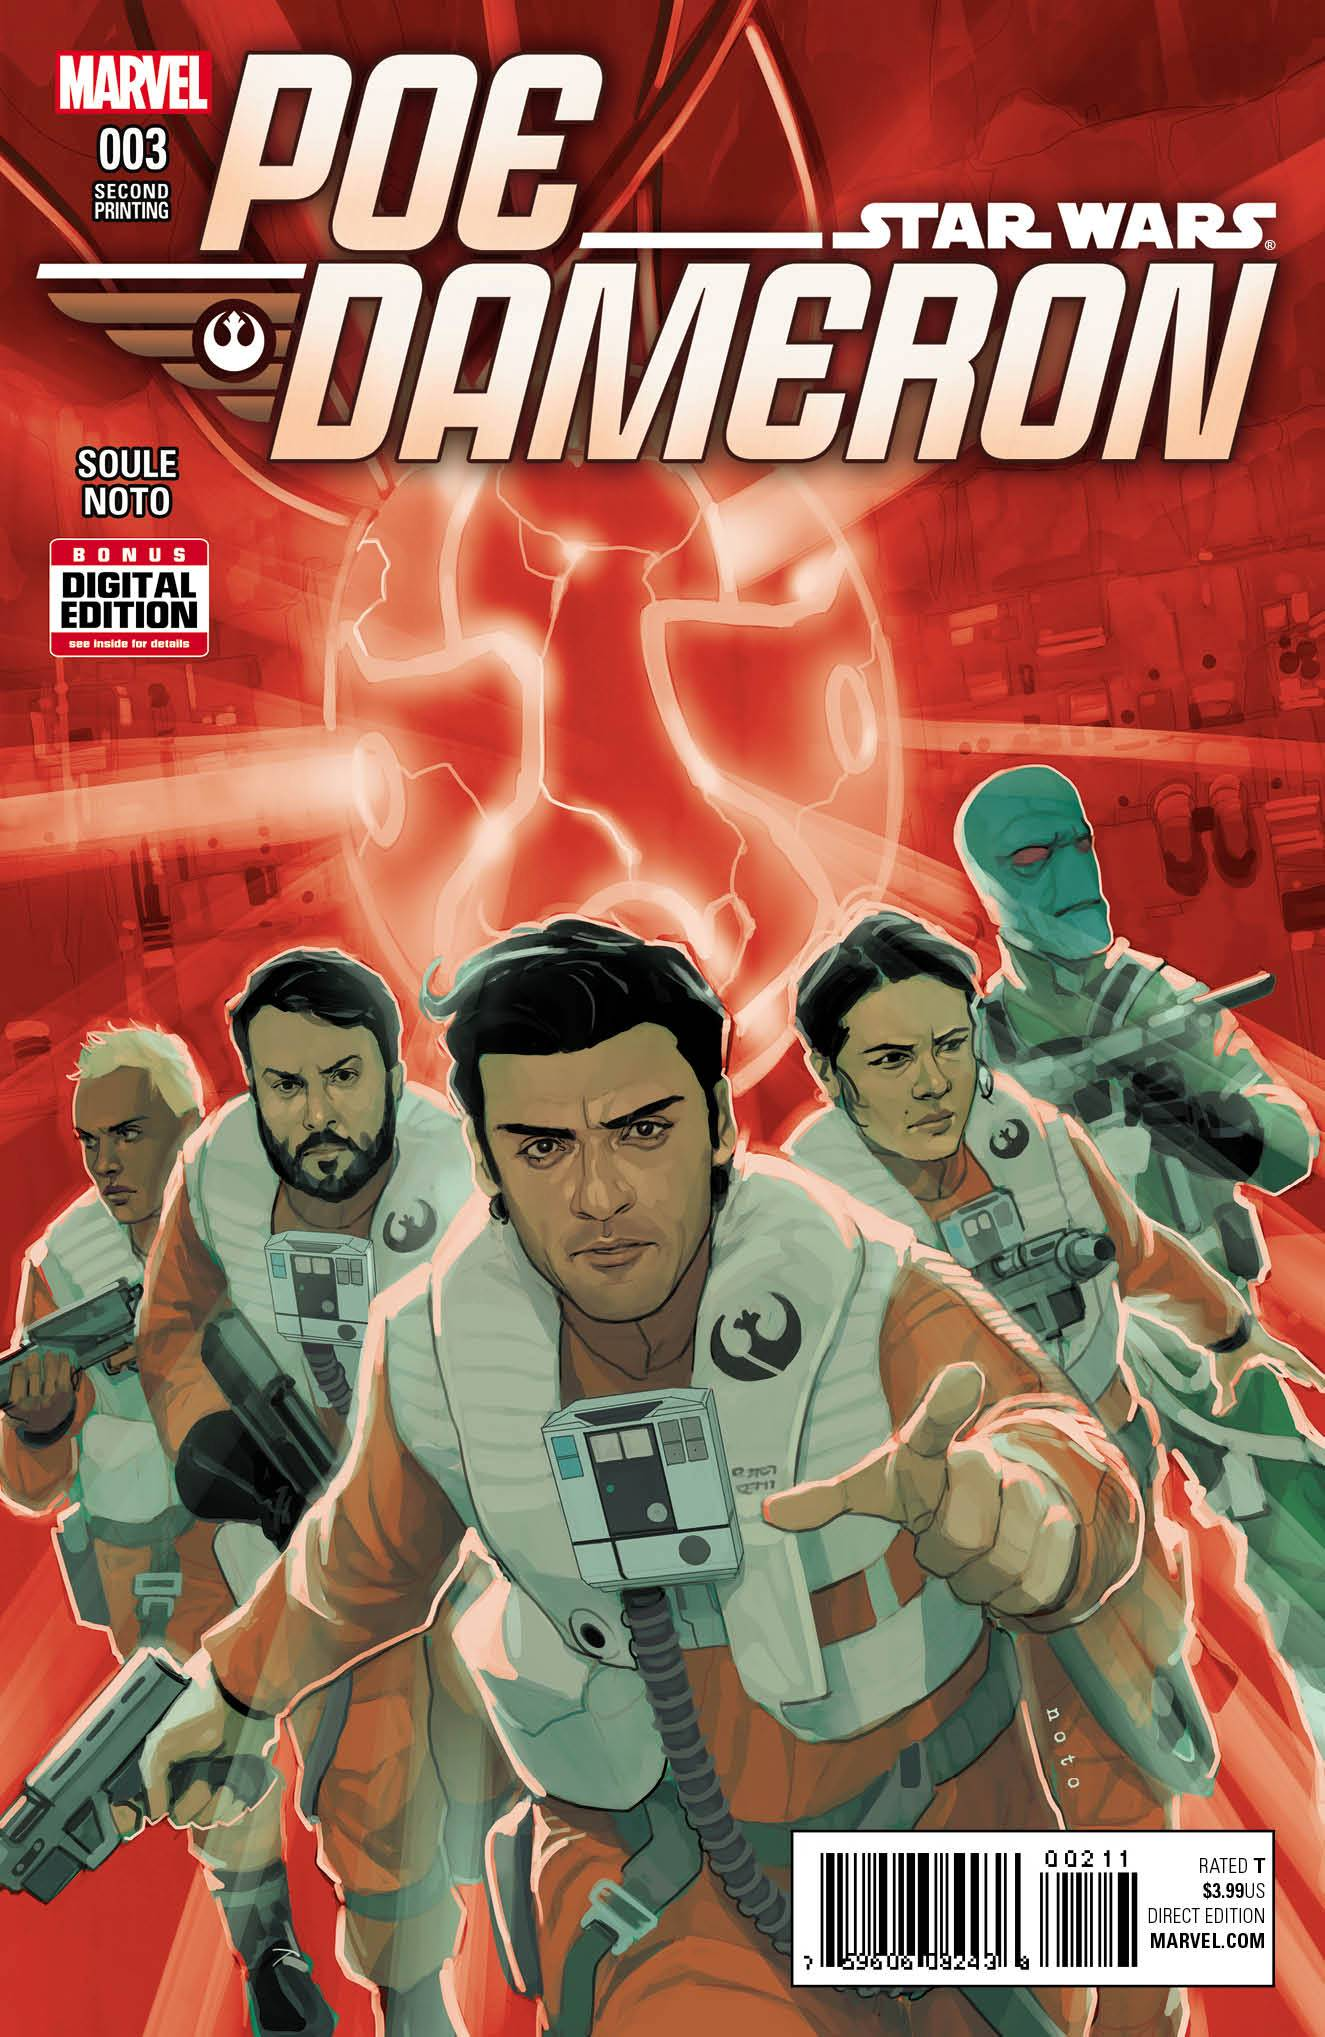 Poe Dameron #3 (2nd Printing) (20.07.2016)